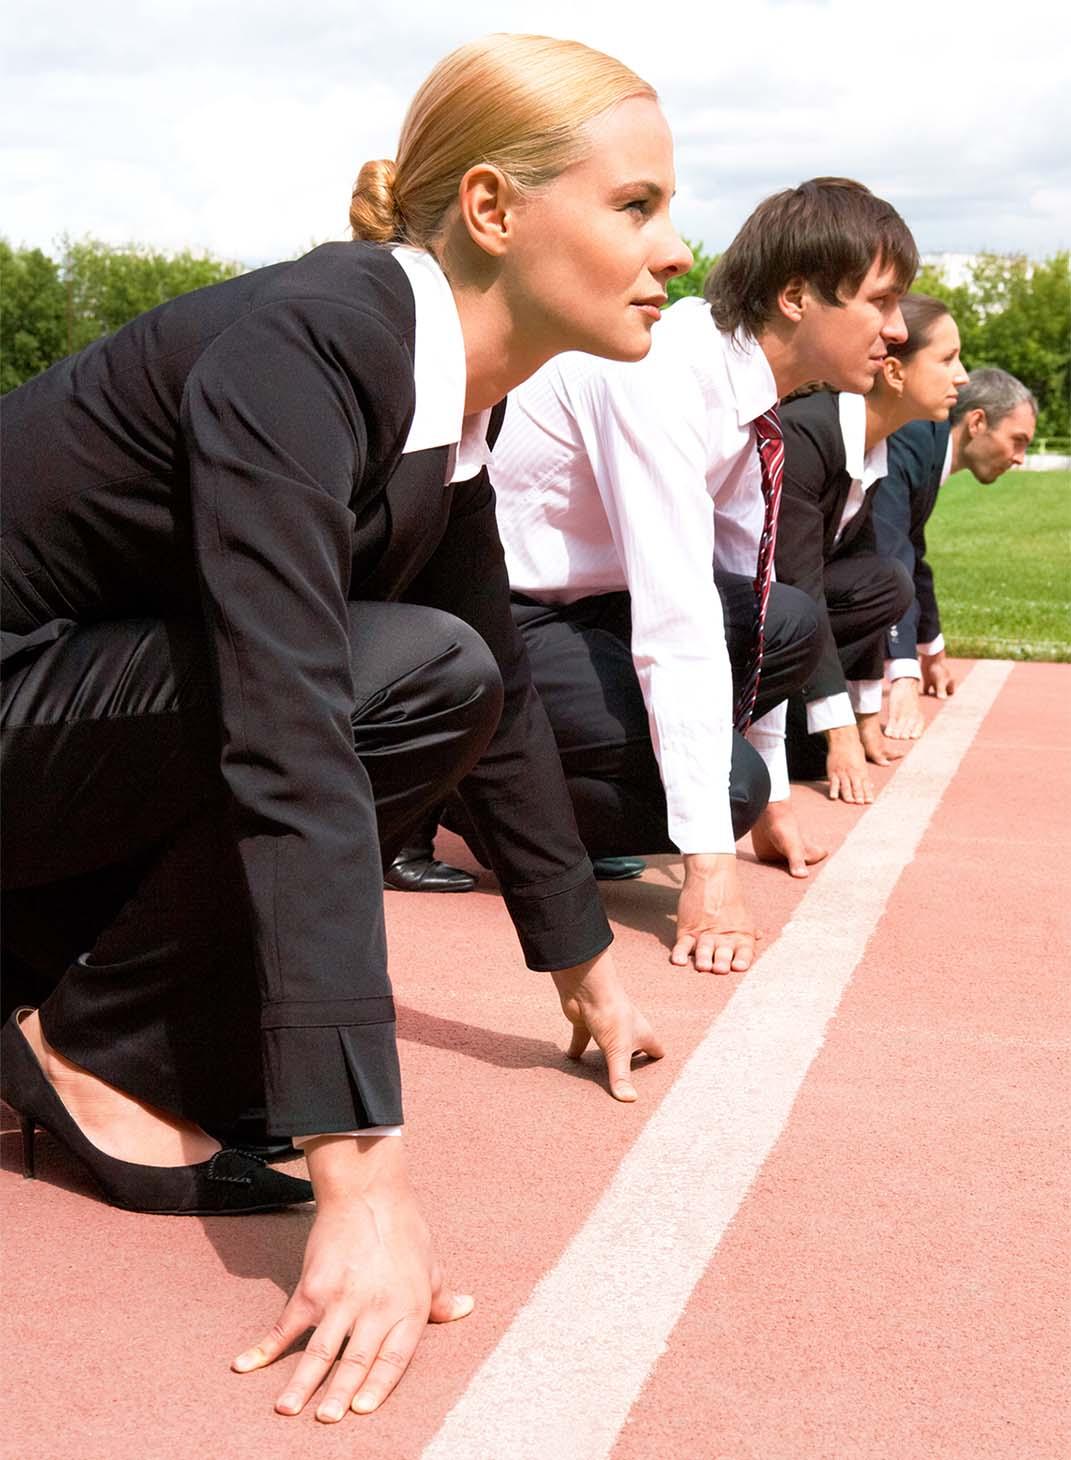 Digitale Wettbewerbsanalyse - Start